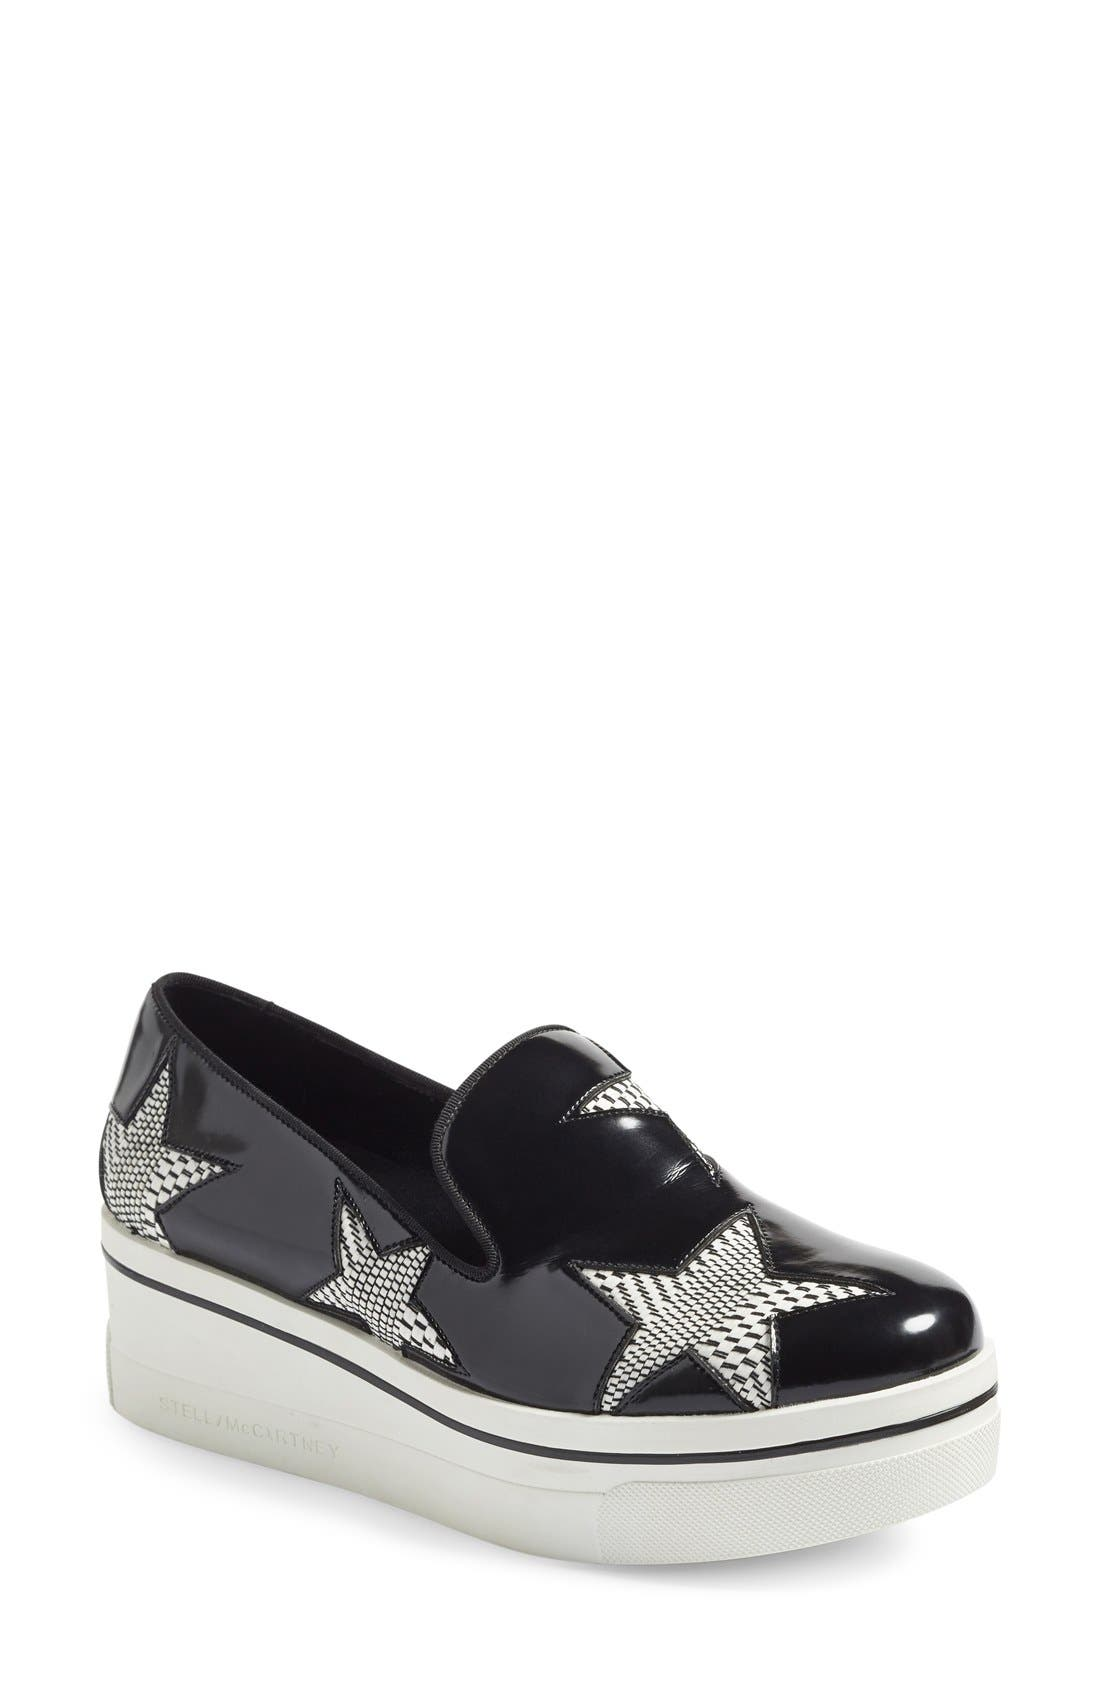 Alternate Image 1 Selected - Stella McCartney 'Binx Star' Slip-On Platform Sneaker (Women)